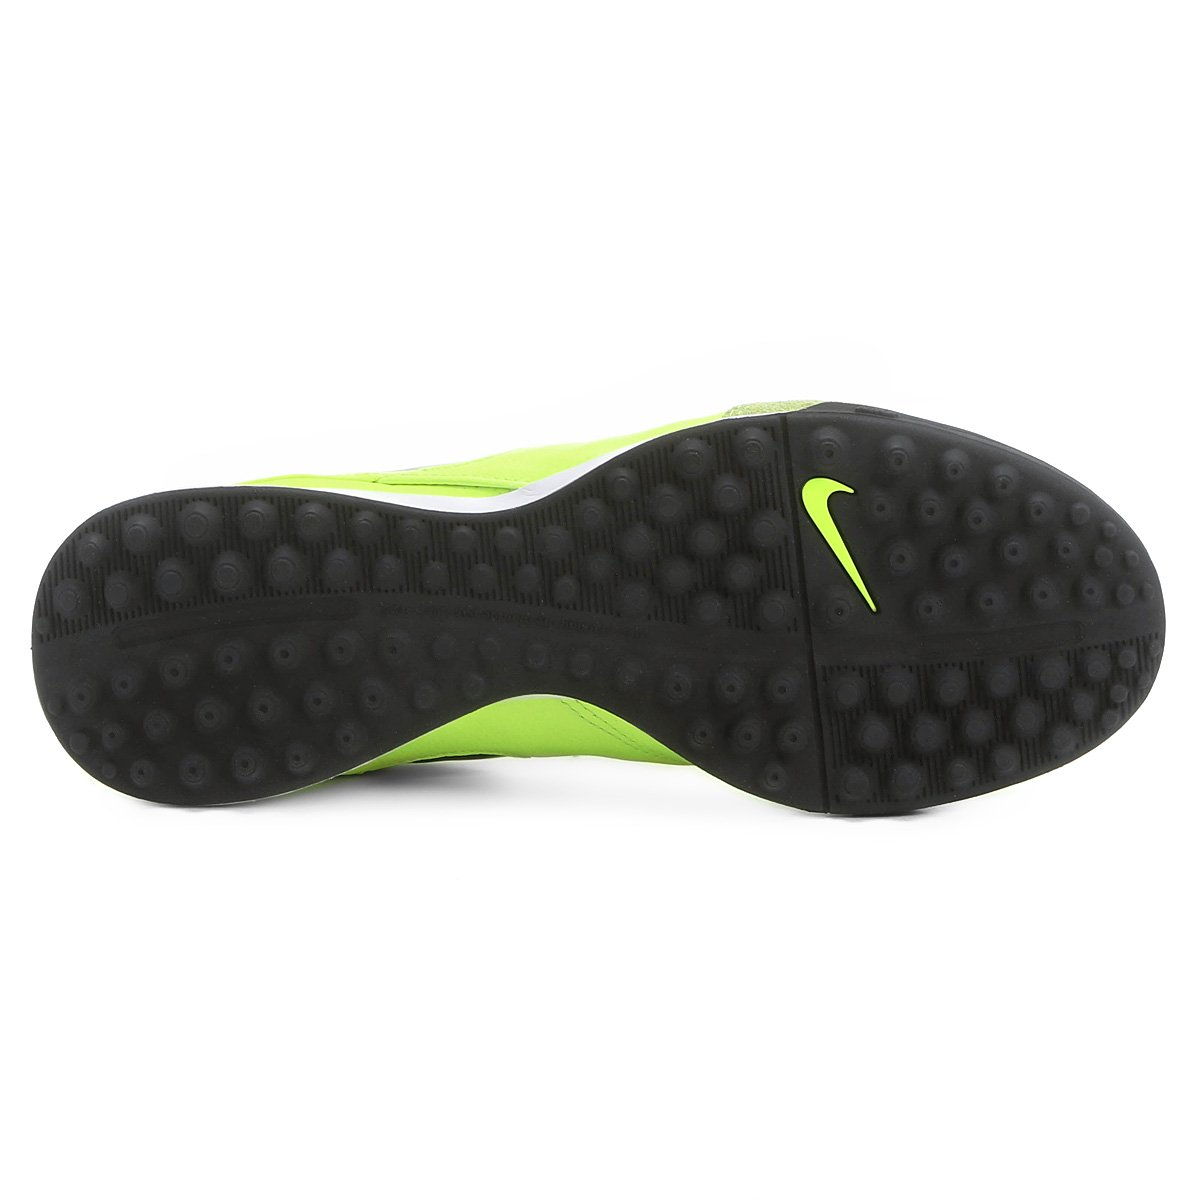 0913313210 Chuteira Society Nike Tiempo Mystic 5 TF - Verde claro - Compre ...